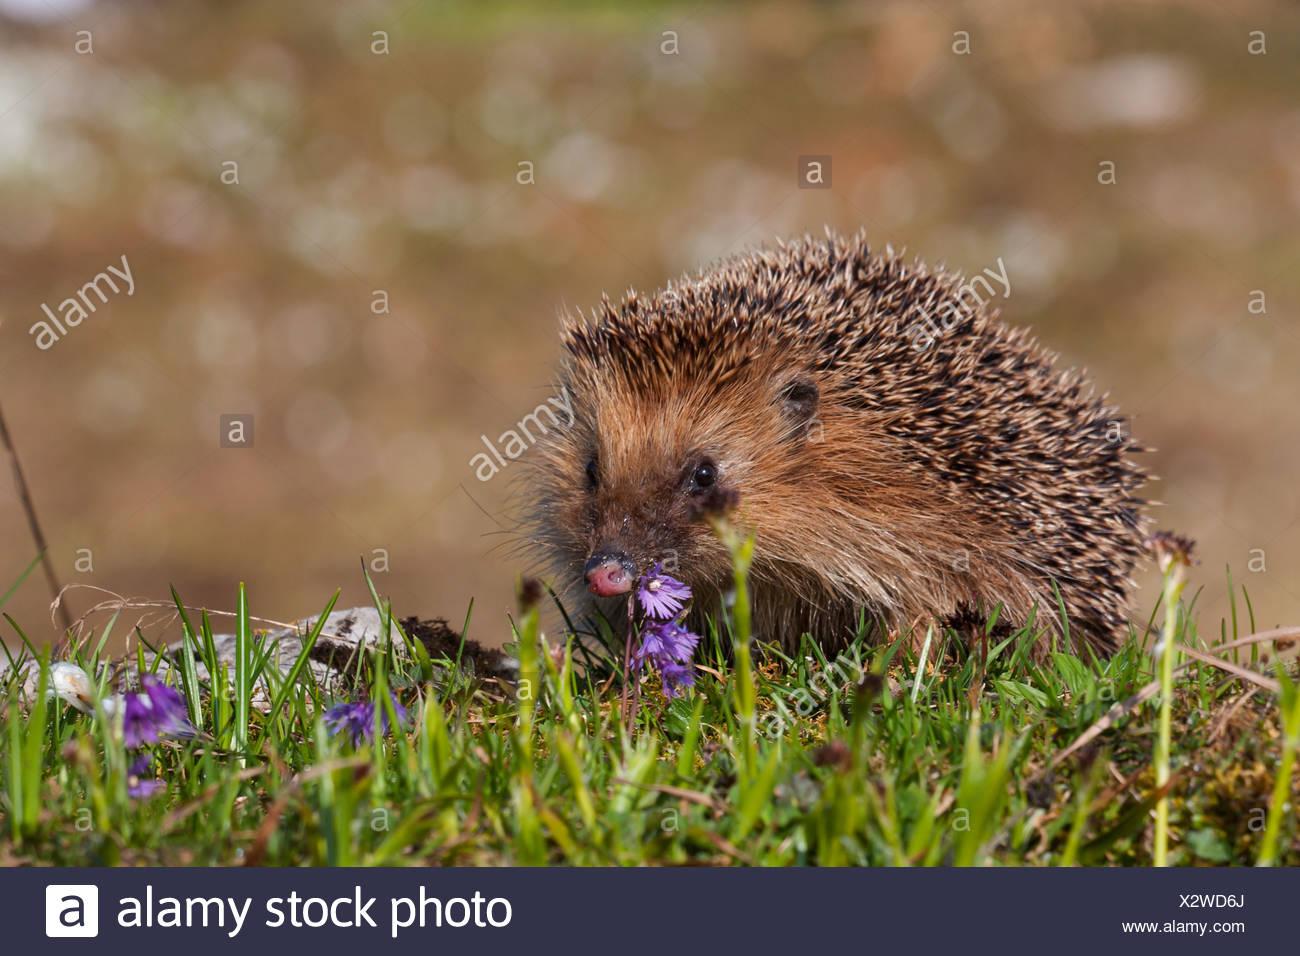 Western hedgehog, European hedgehog (Erinaceus europaeus), in a mountain meadow with snowbell, Switzerland, Alpstein, Schwaegalp - Stock Image